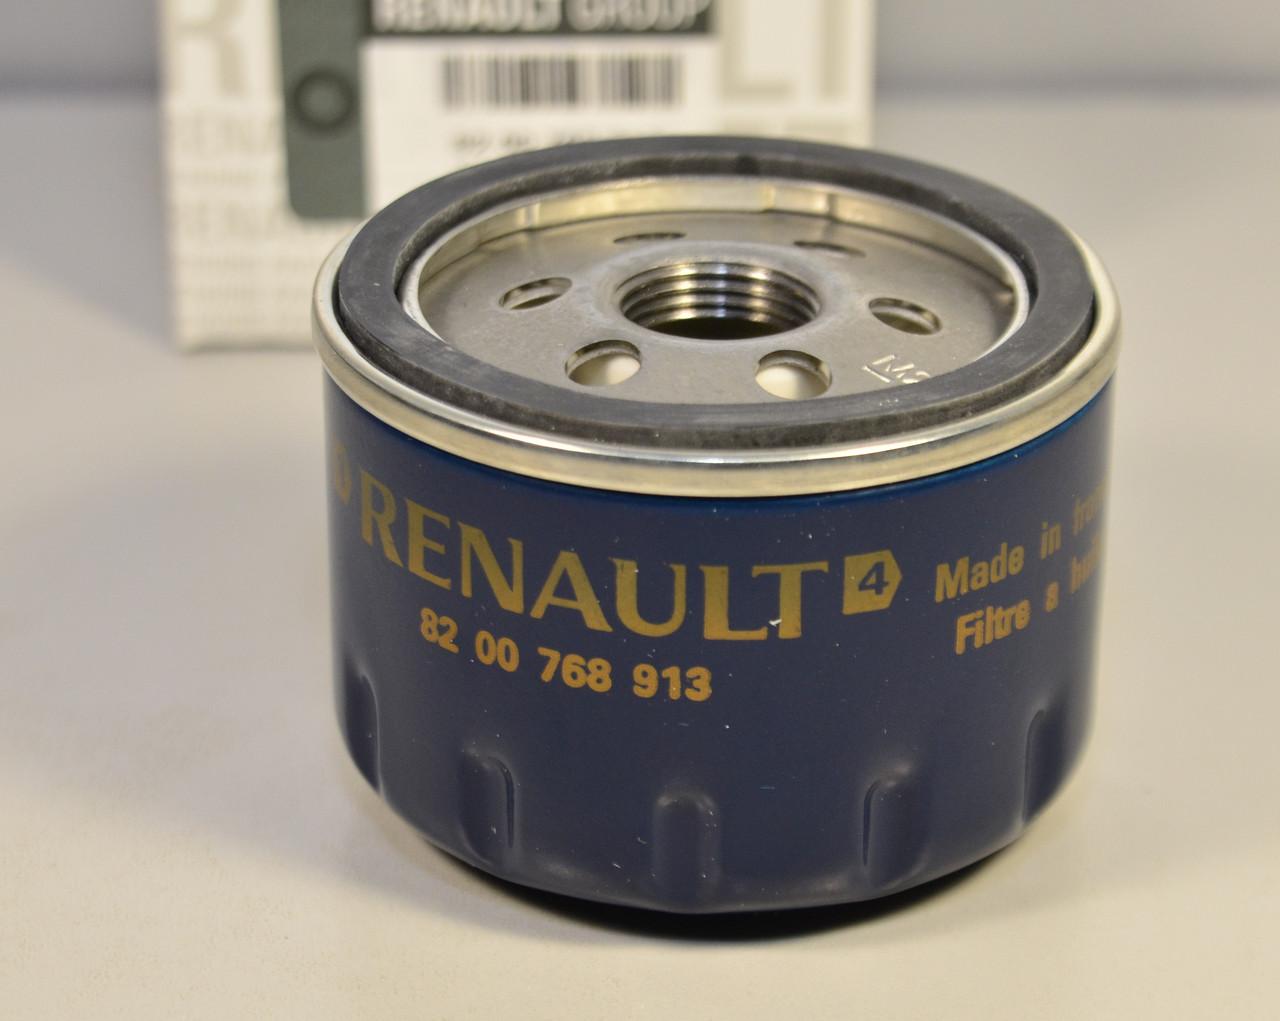 Фільтр масла на Renault Kangoo 1997->2008 1.5 dCi, 1.9 dCi 1.4, 1.6 i 16V — RENAULT (Оригінал) - 8200768913